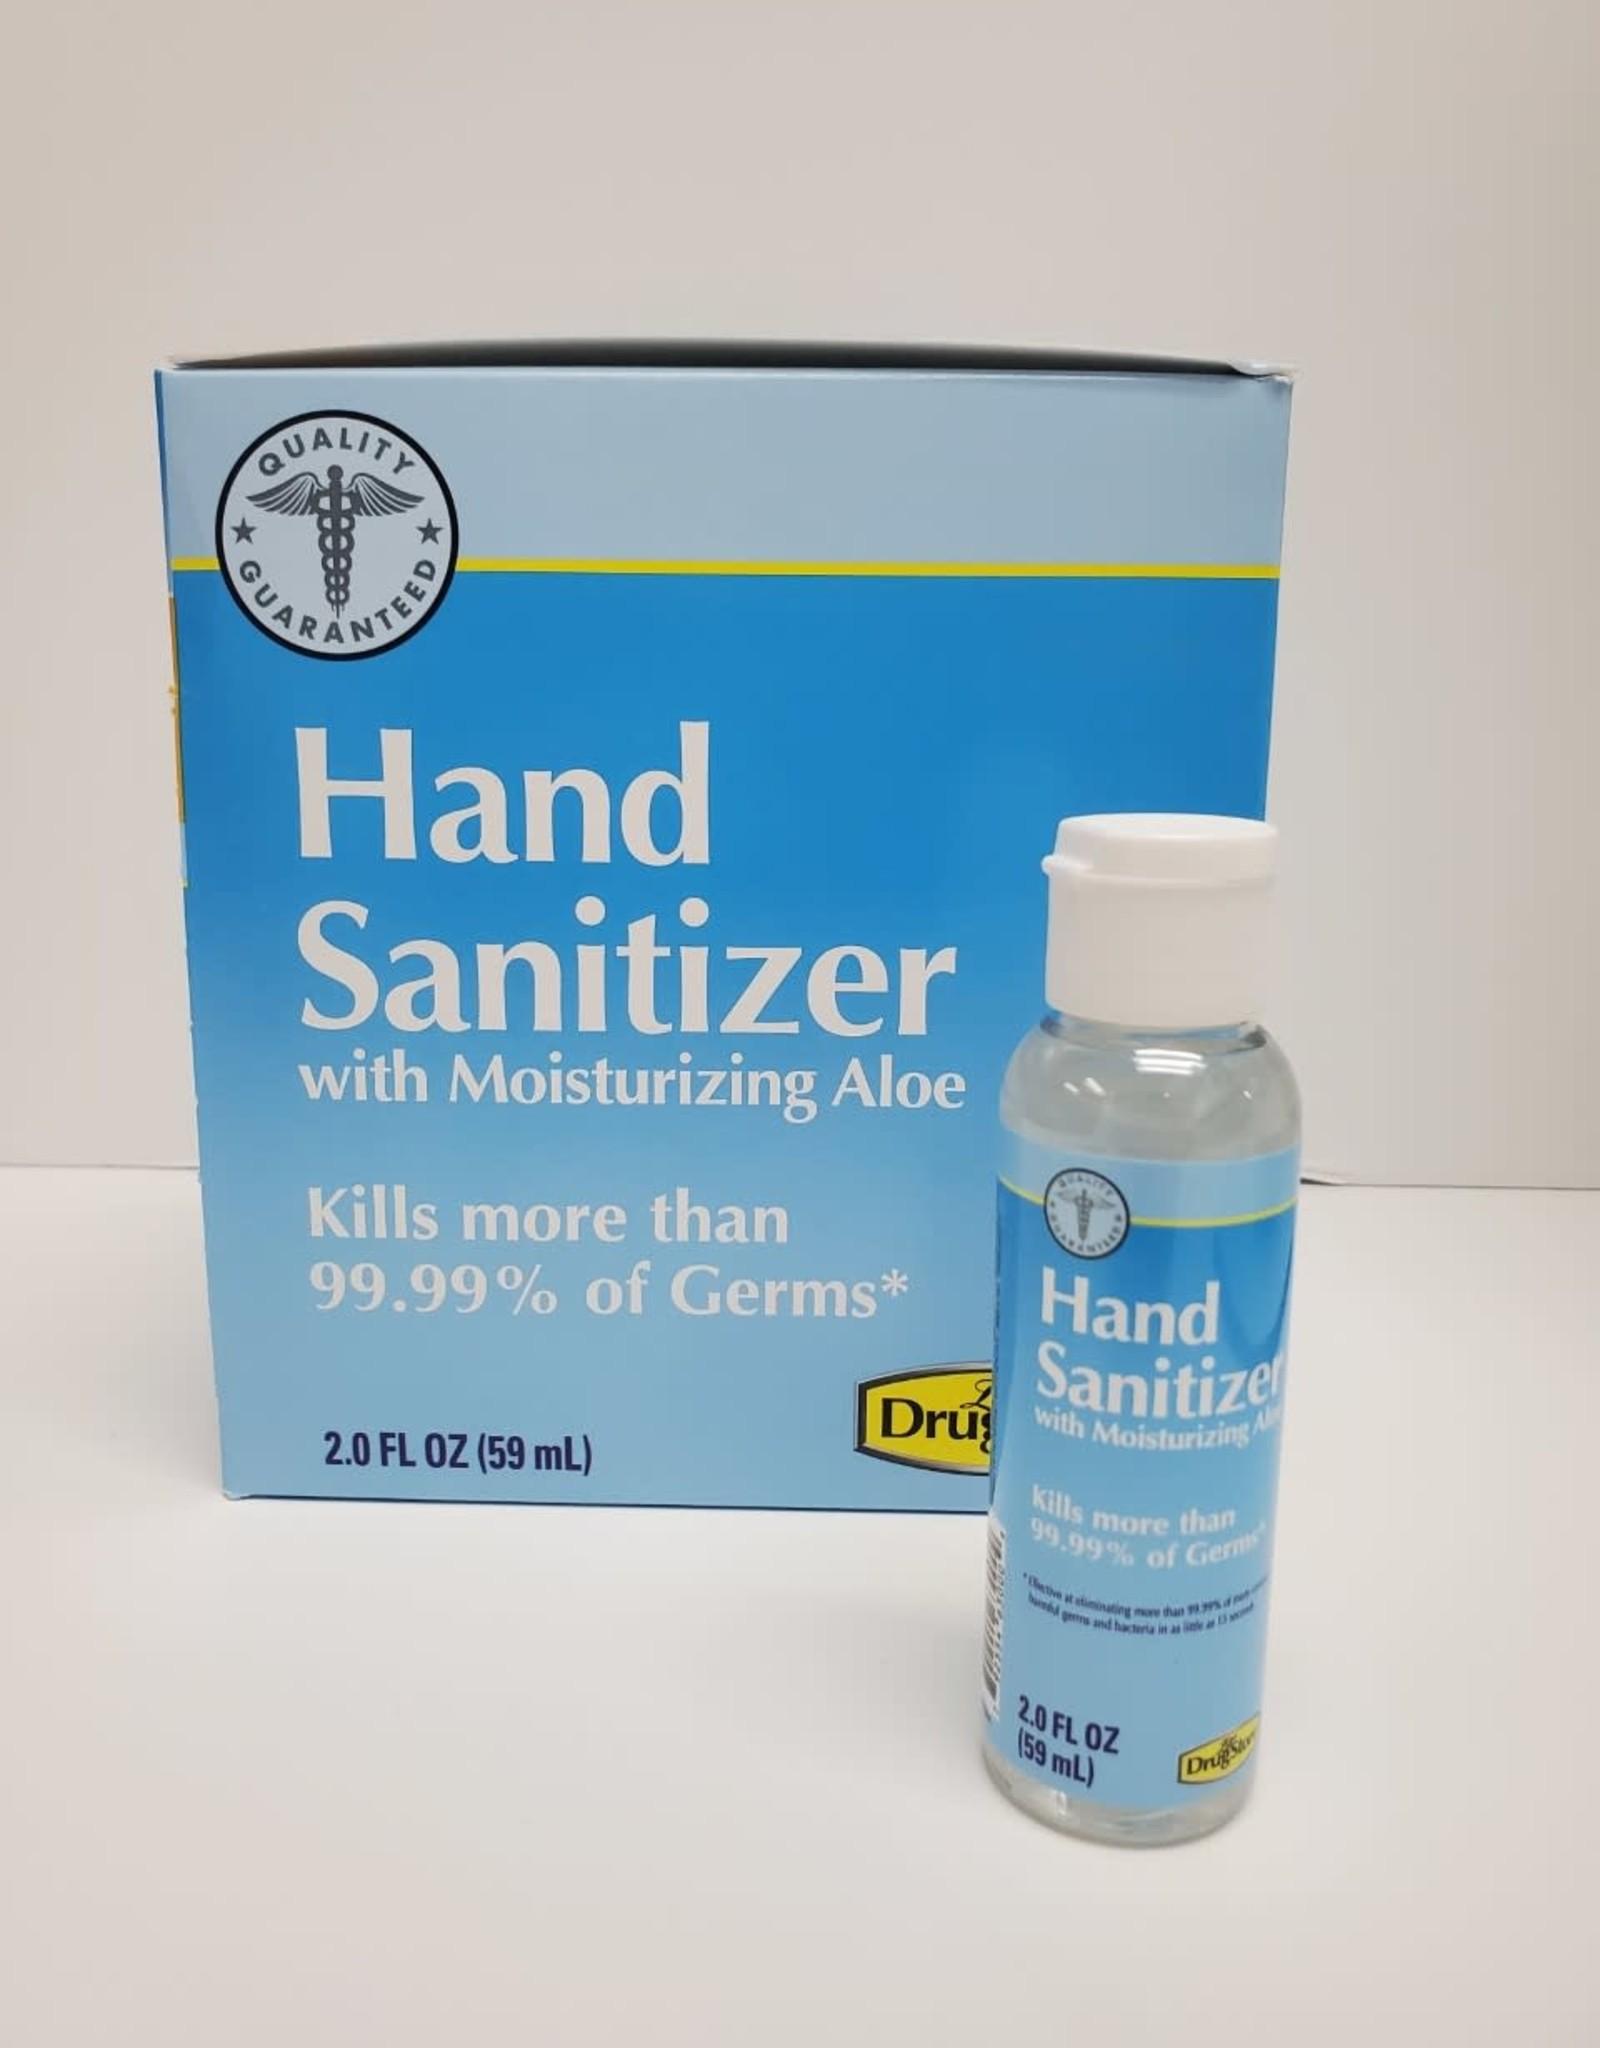 Lil' Drug Store Brand Hand Sanitizer